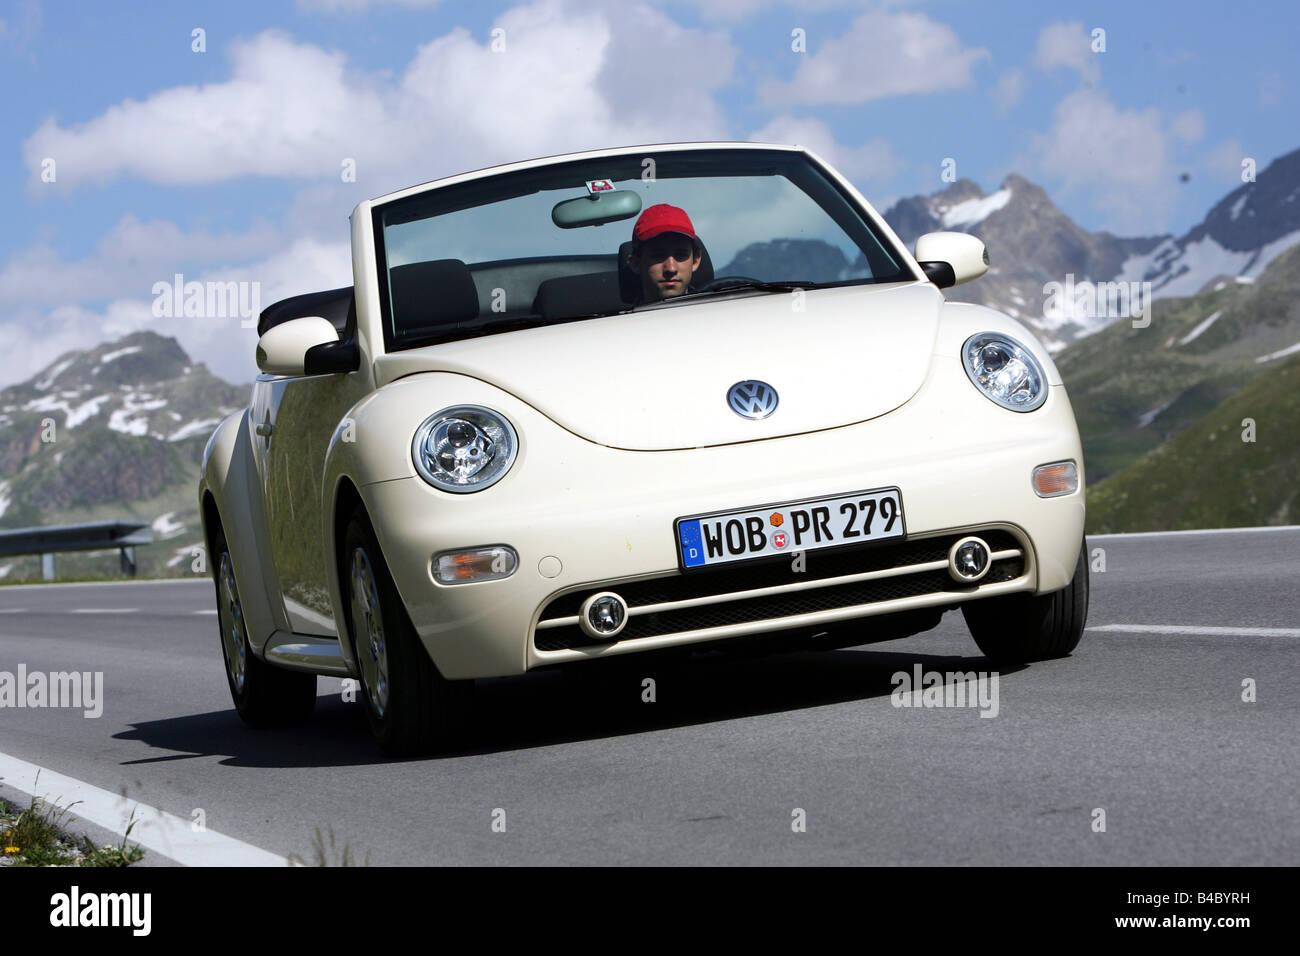 VW 2003 vw bug : Vw New Beetle Stock Photos & Vw New Beetle Stock Images - Alamy